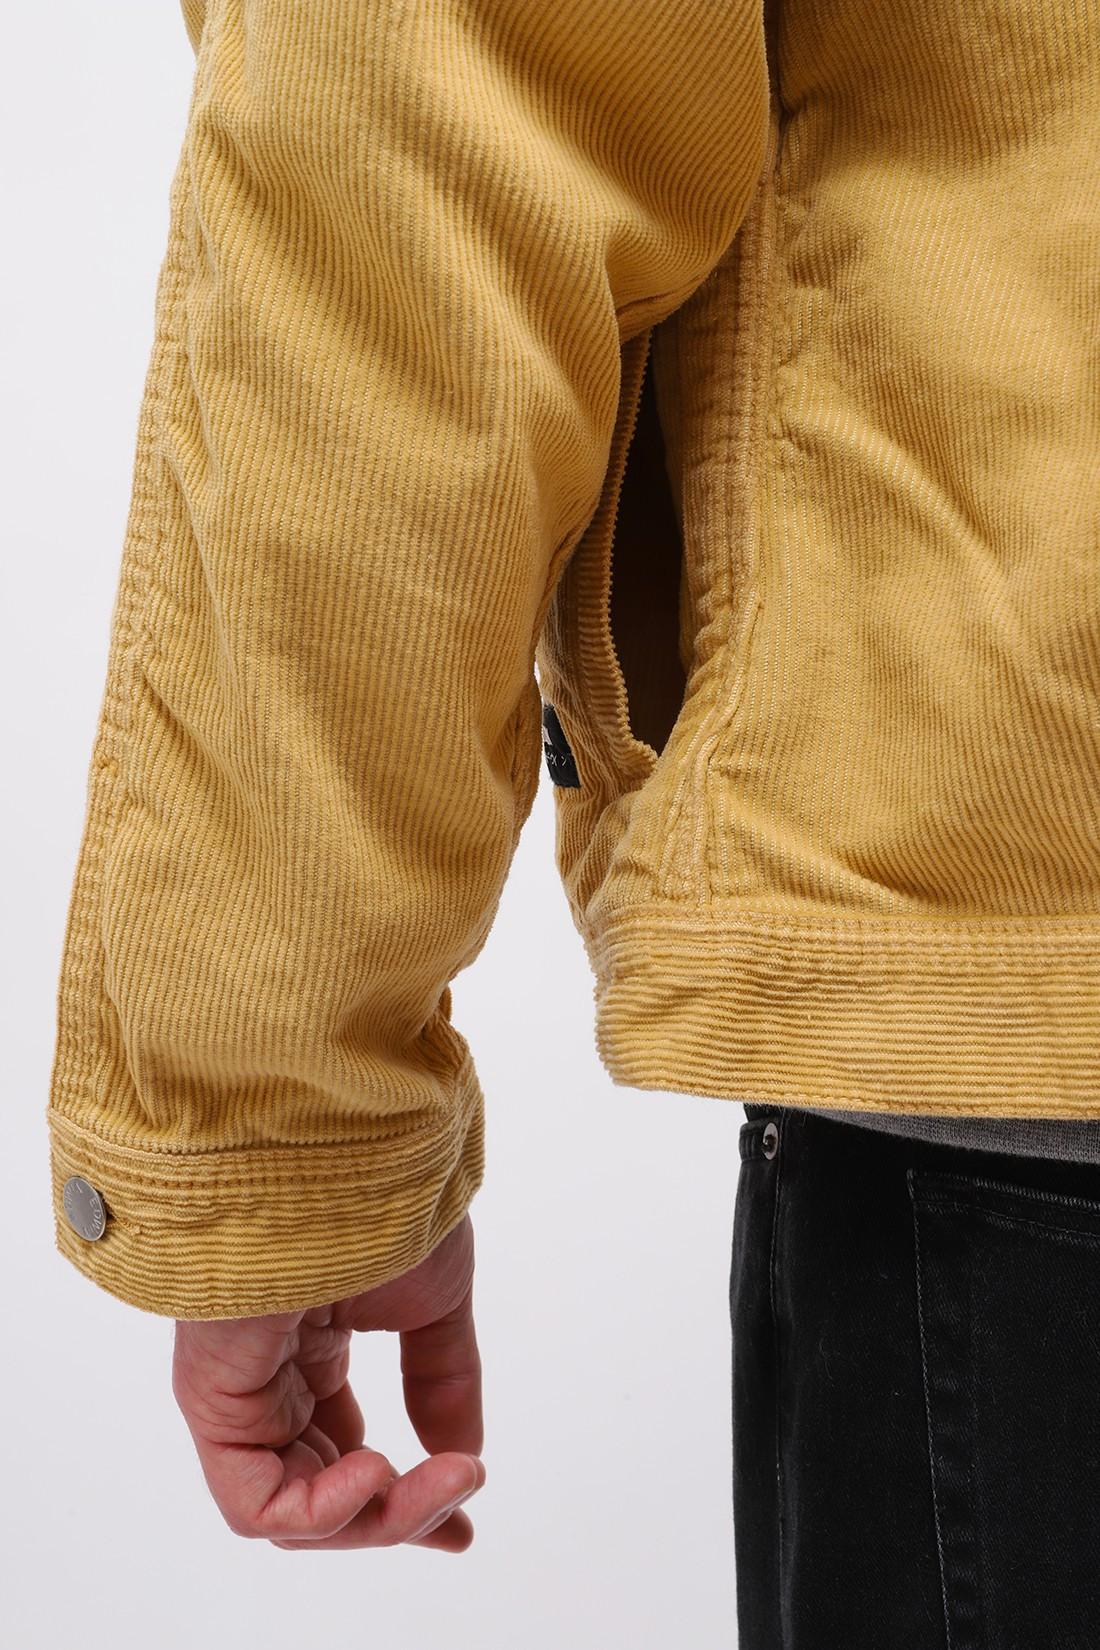 EDWIN / Sten zip jacket corduroy Curry